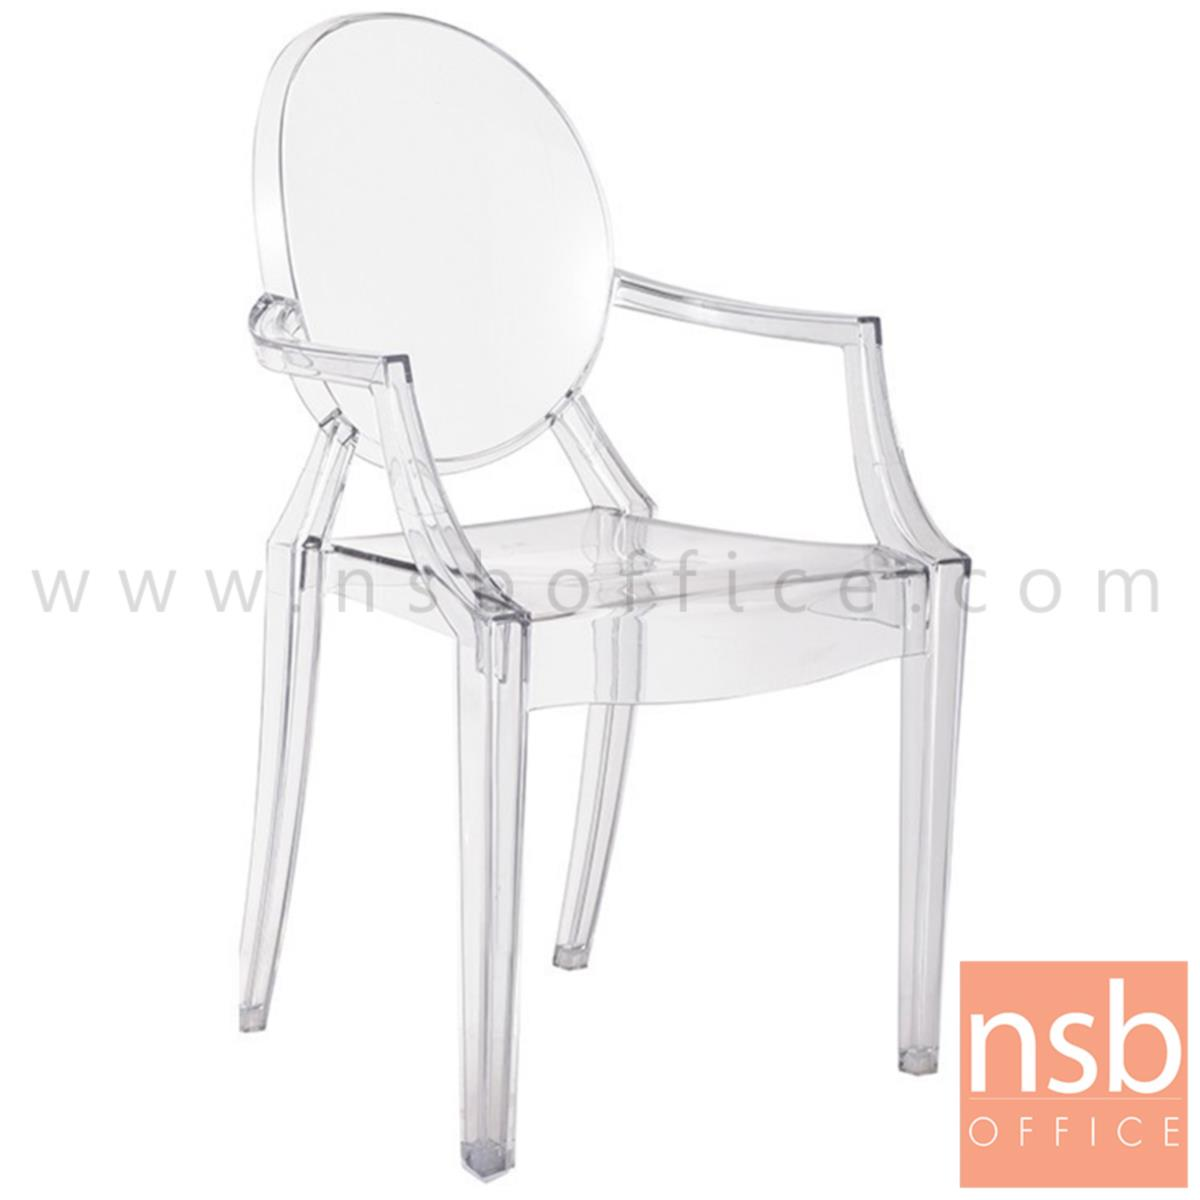 B05A115:เก้าอี้โมเดิร์นพลาสติกใสล้วน รุ่น Barrymore (แบร์รีมัวร์) ขนาด 53W cm.